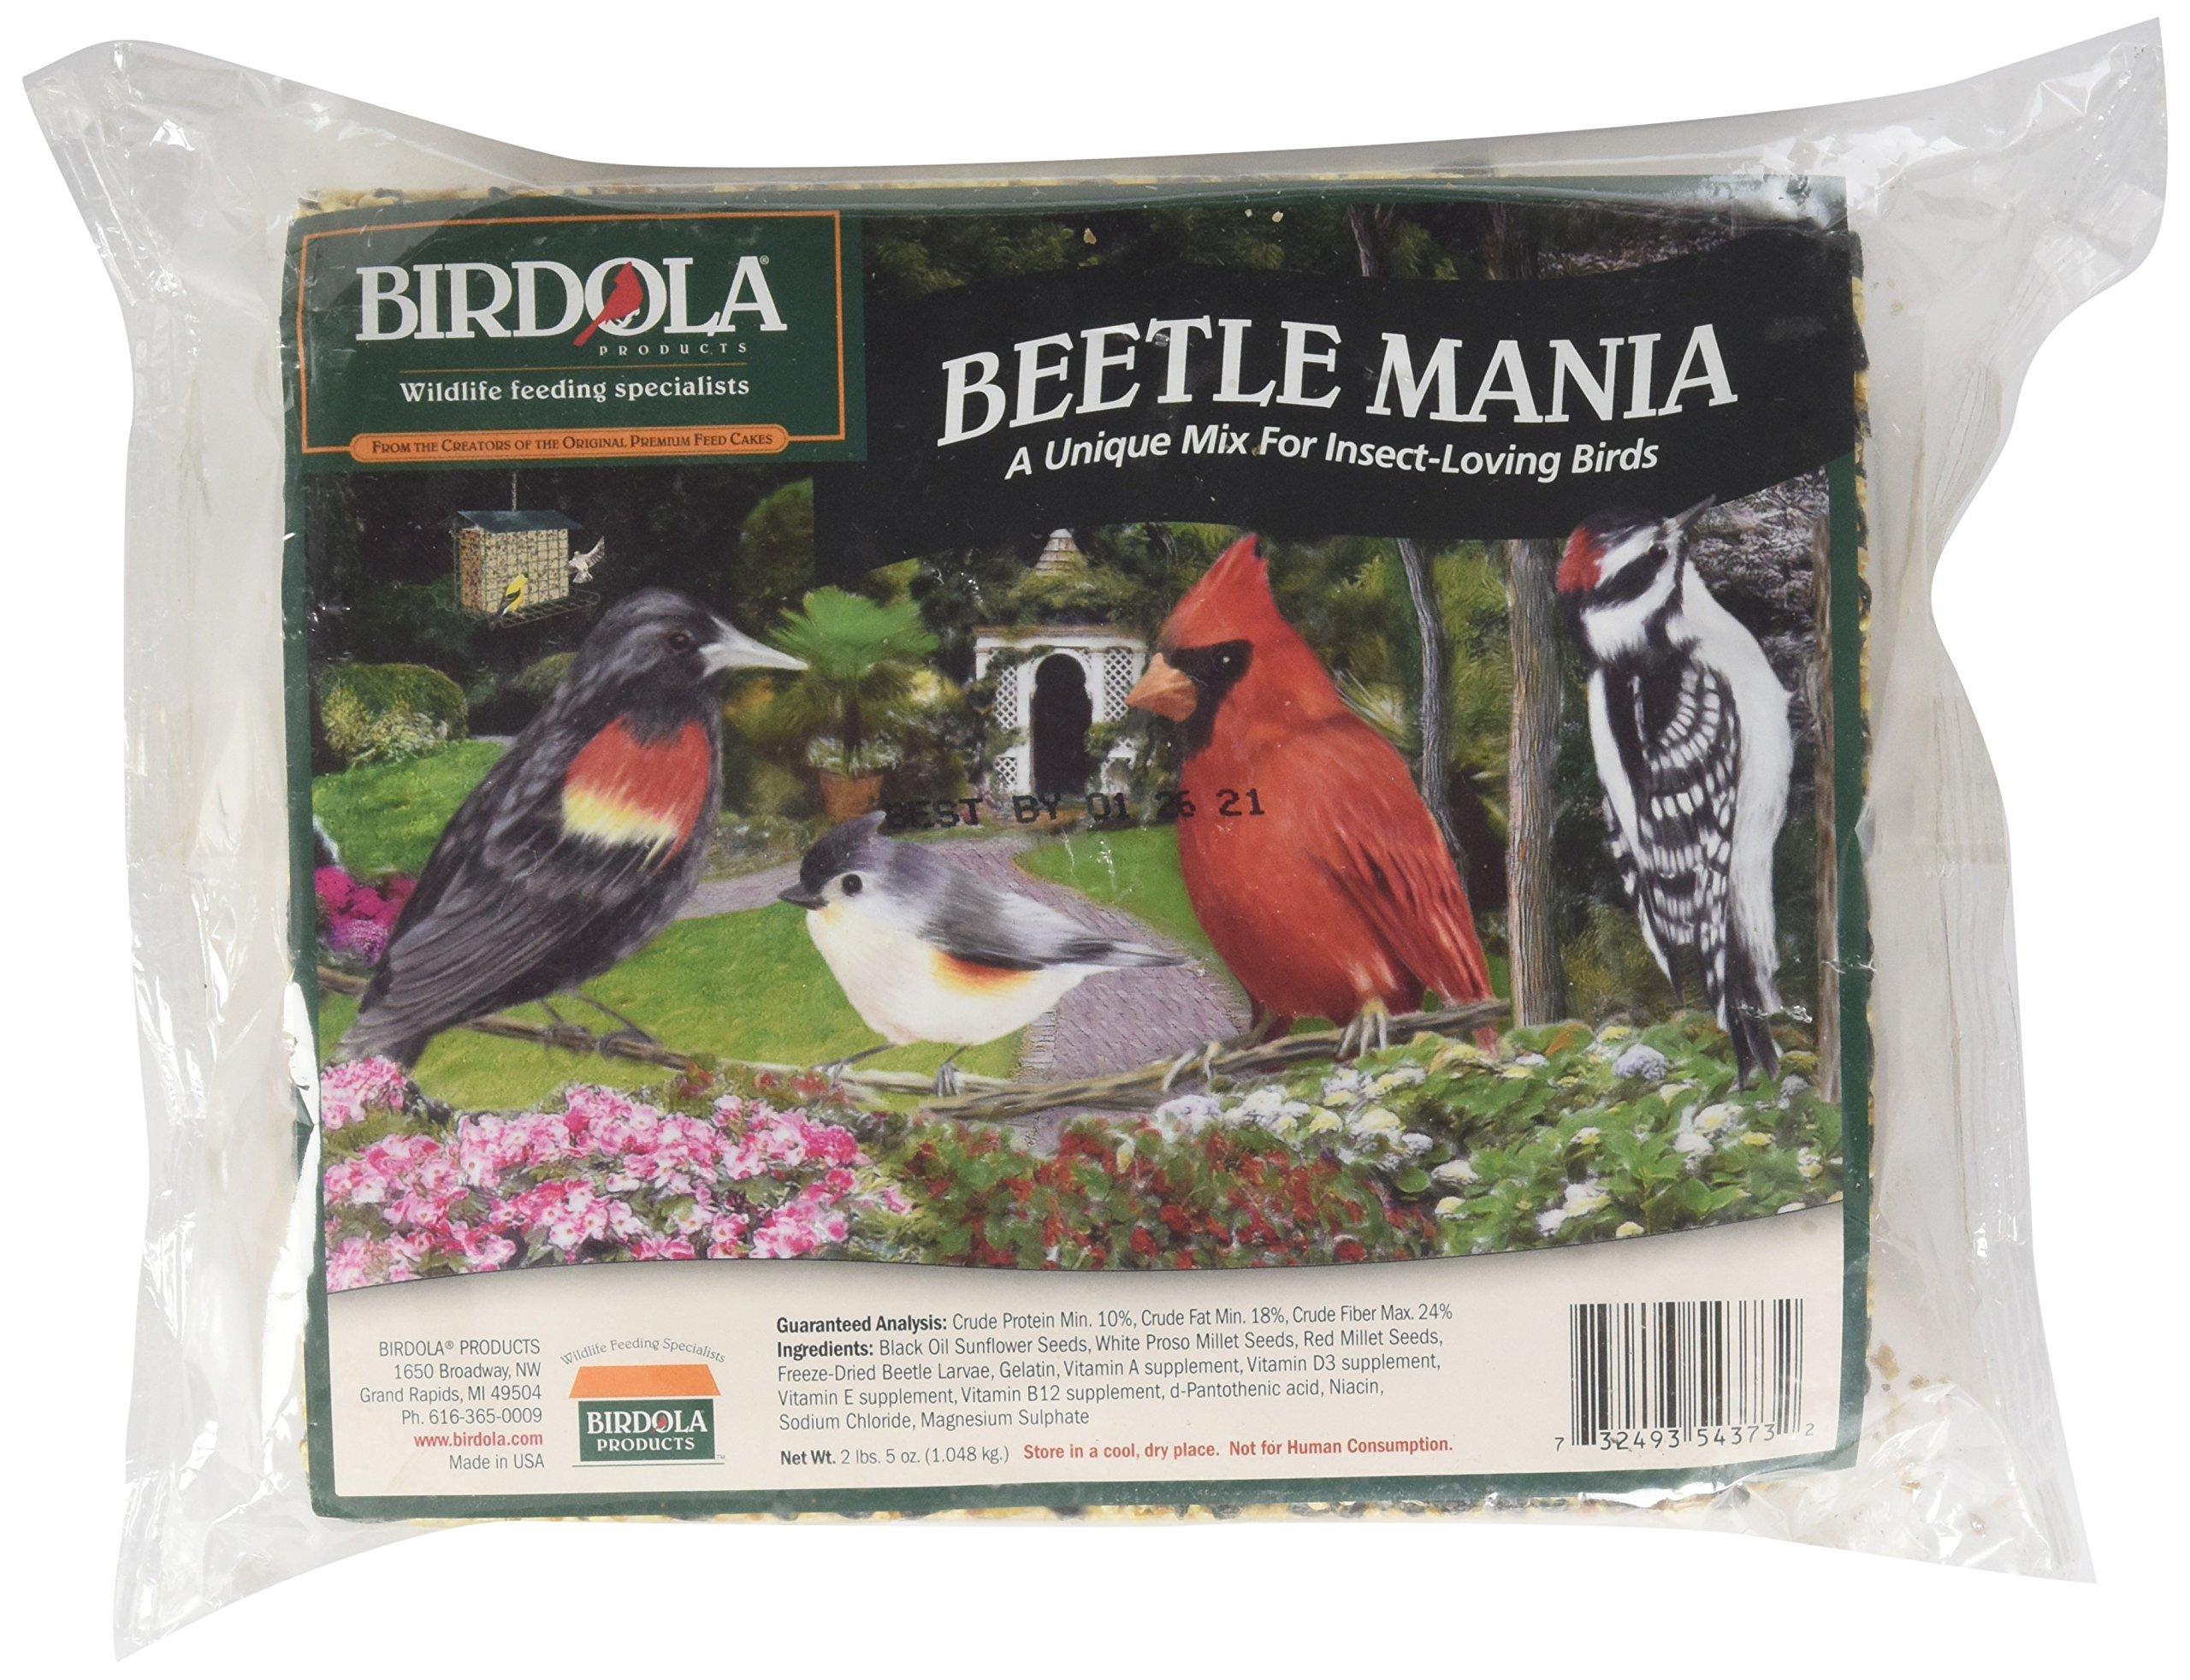 Birdola Beetle Mania Seed Cake 2.2 Pounds, For Insect-Loving Wild Birds by Birdola (Image #1)